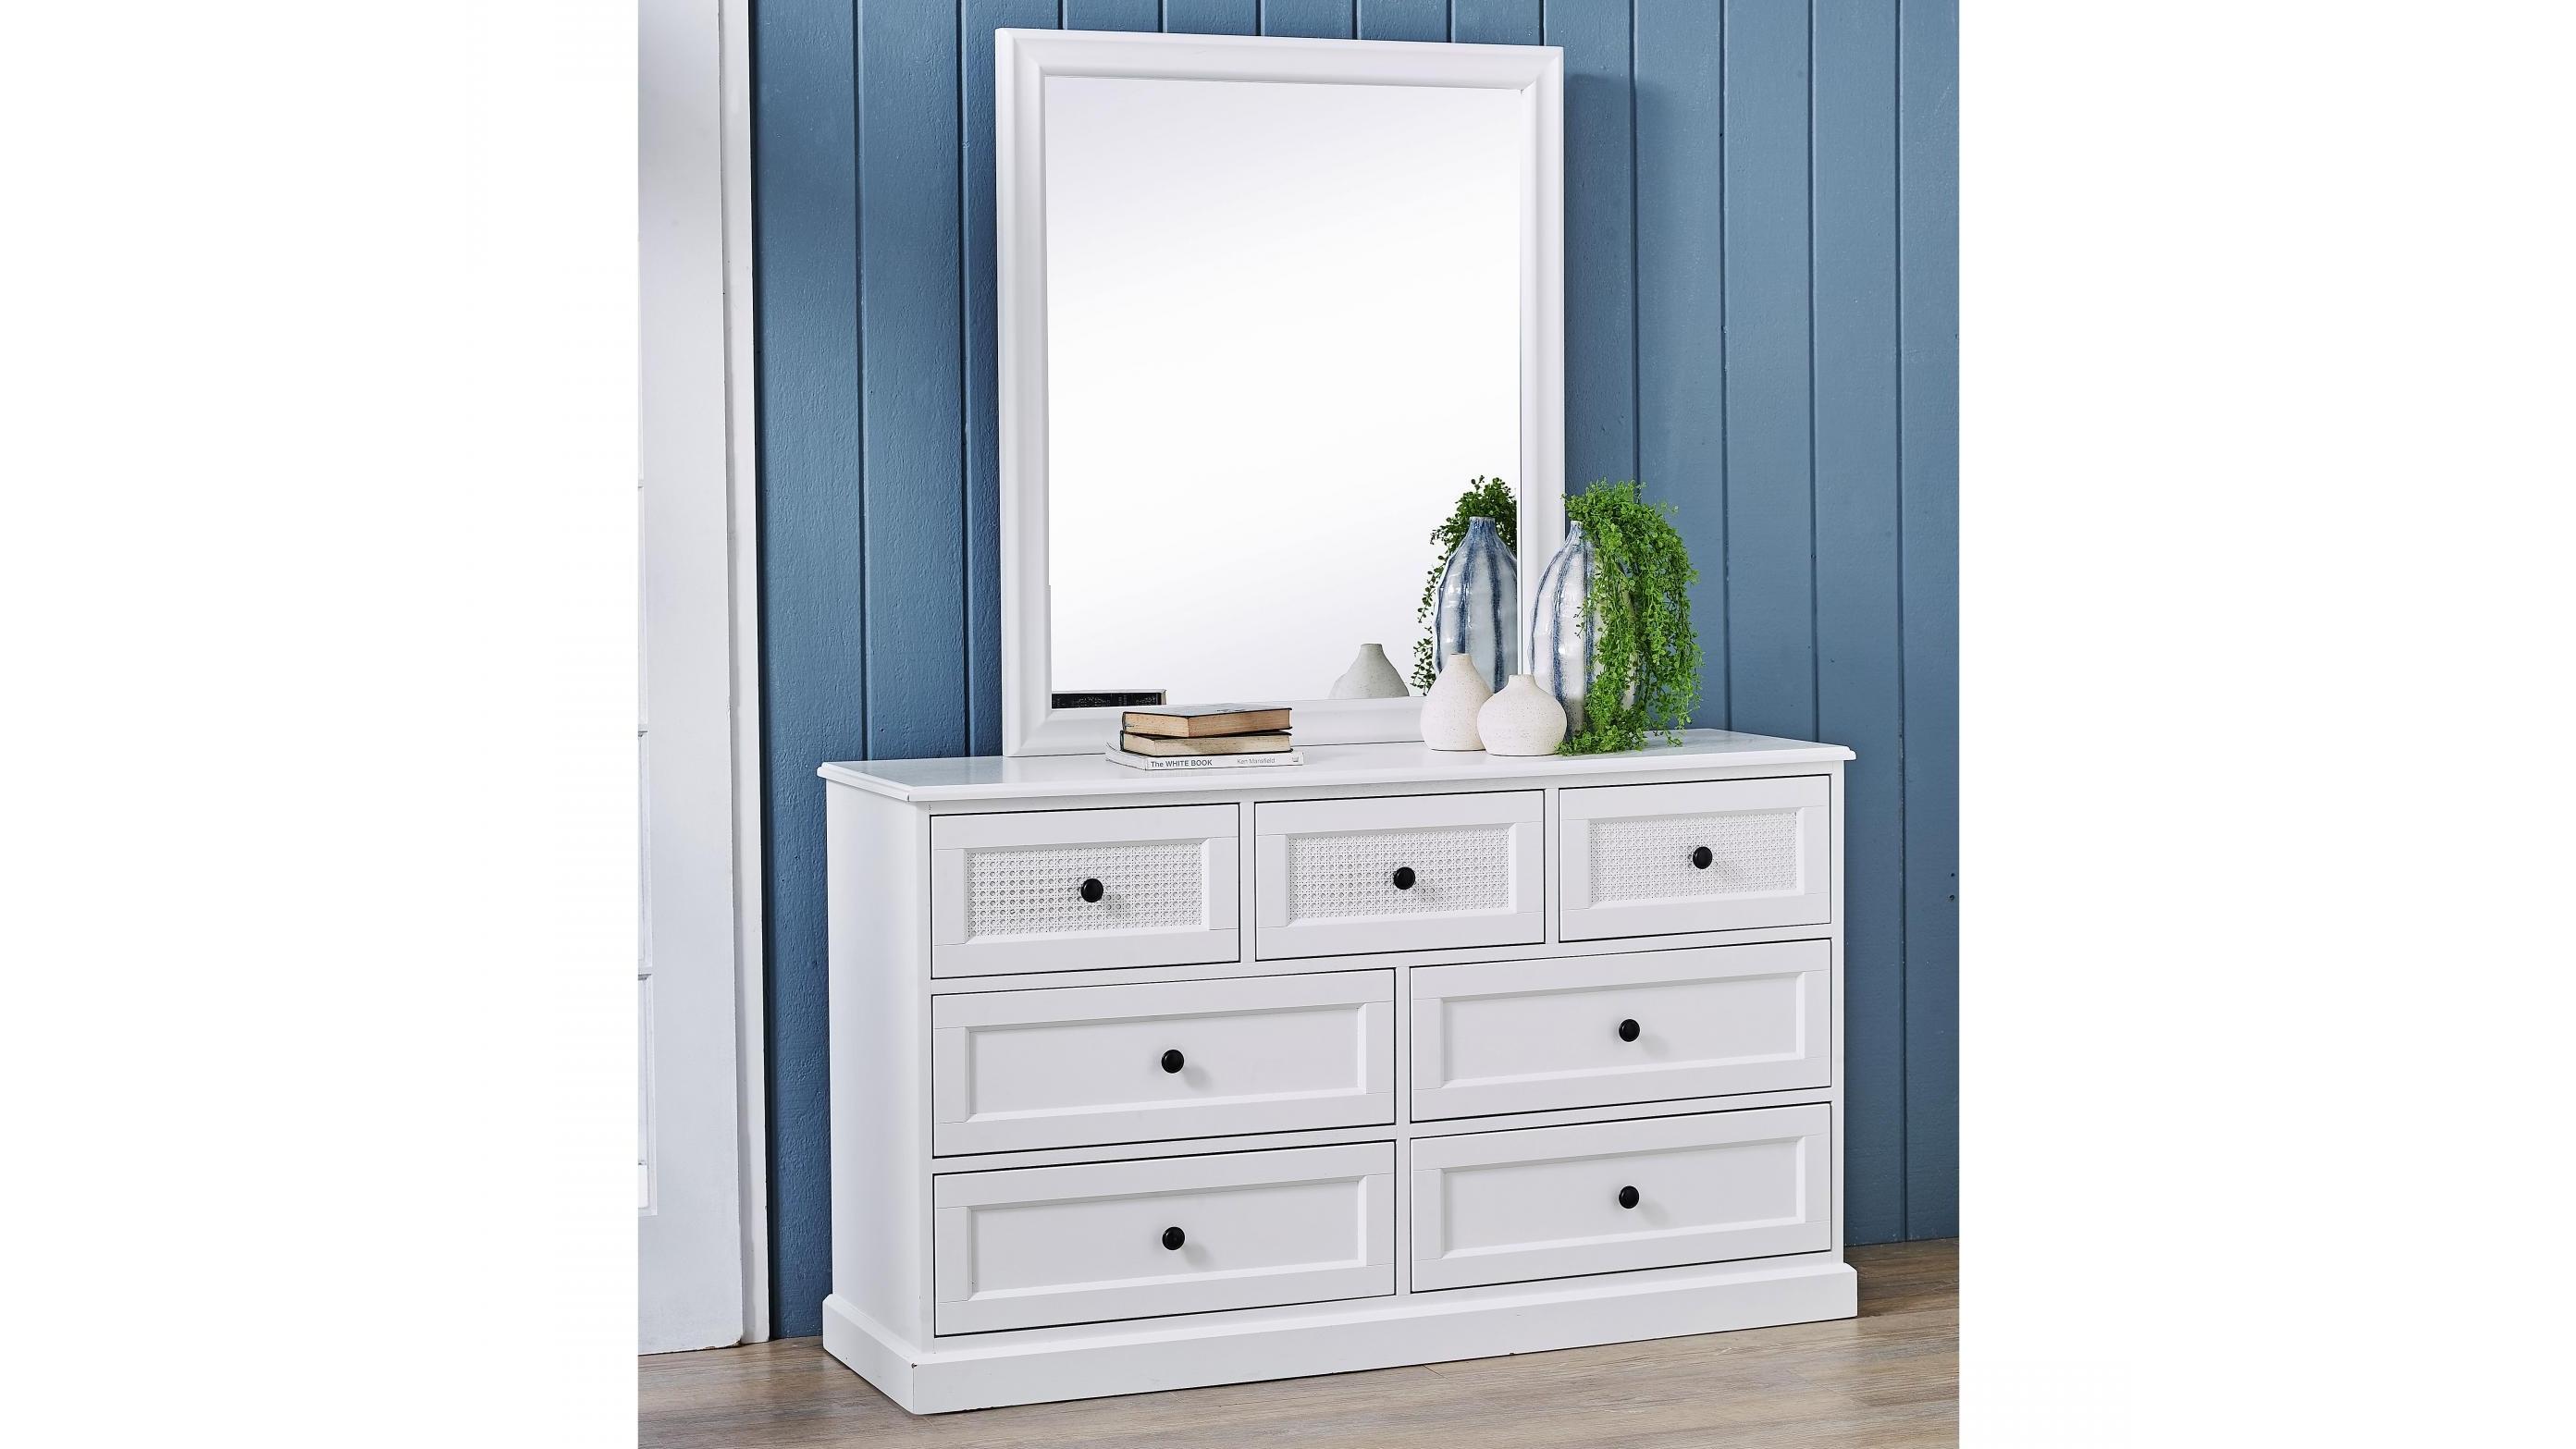 Buy Parisian 7 Drawer Dresser With Mirror Harvey Norman Au